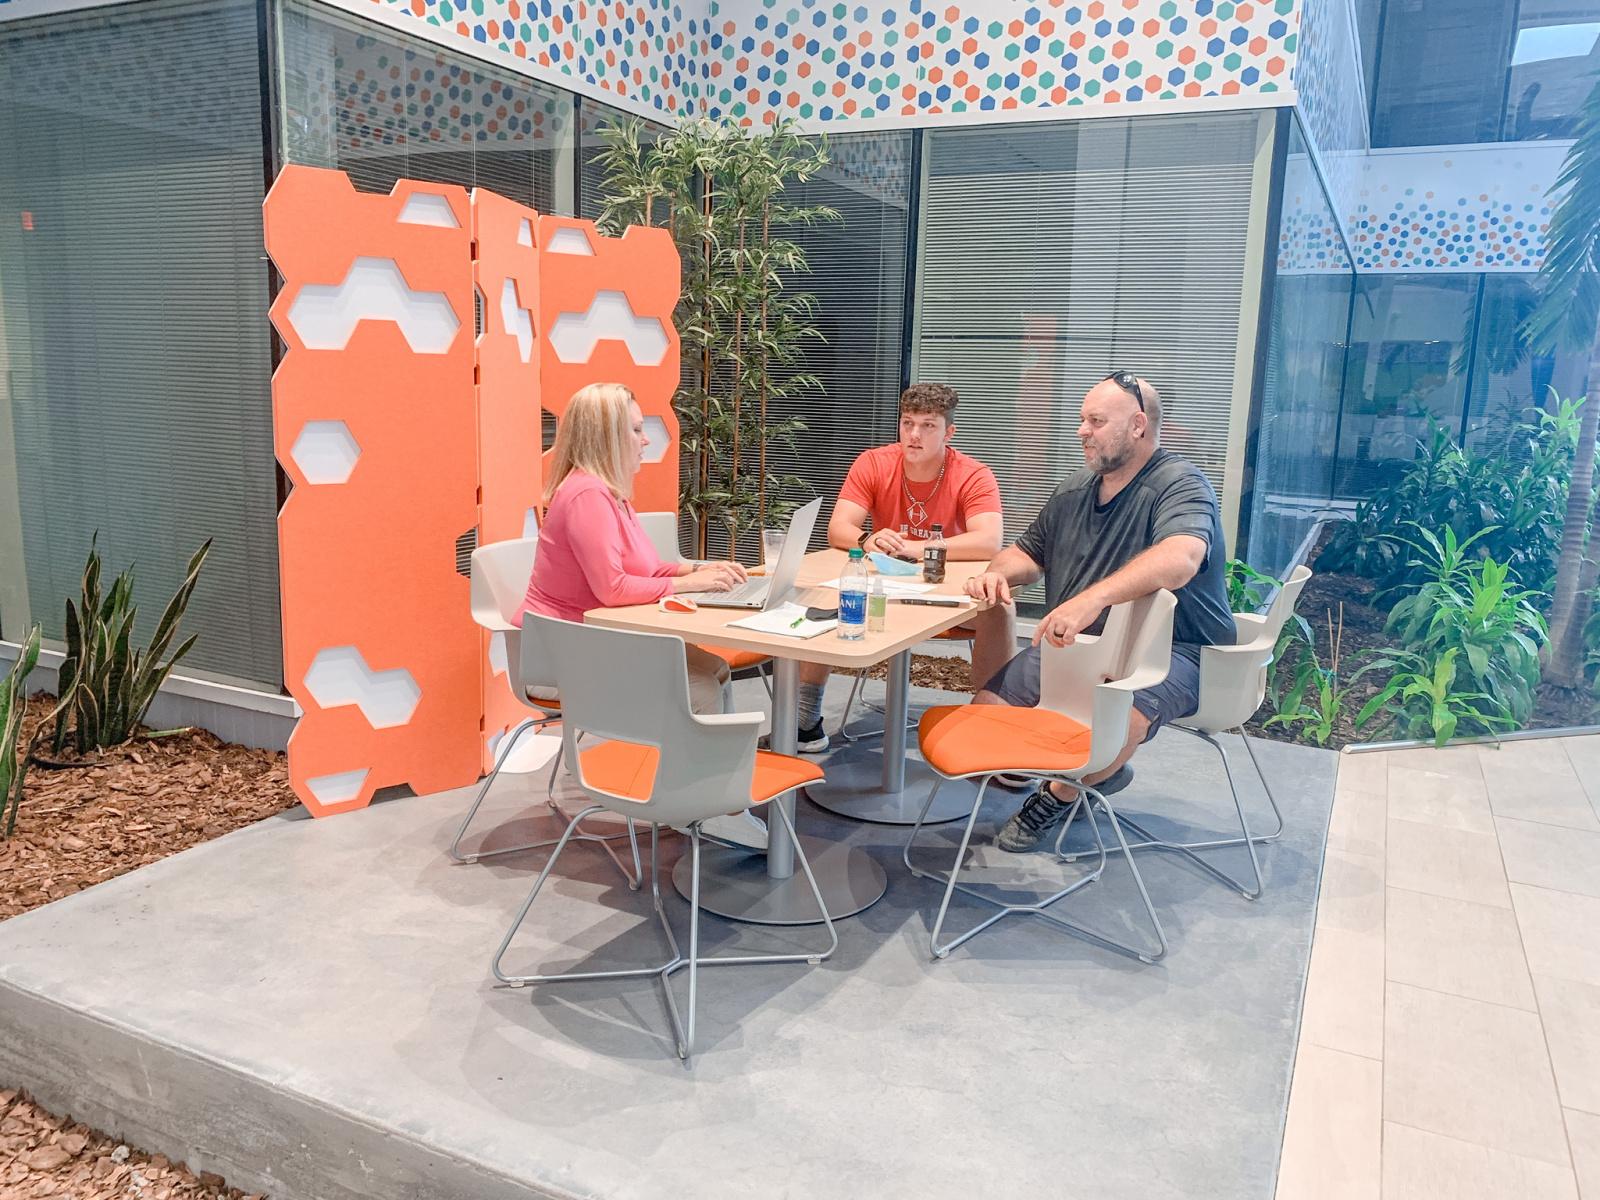 northdale_lobby-open-workspace-10